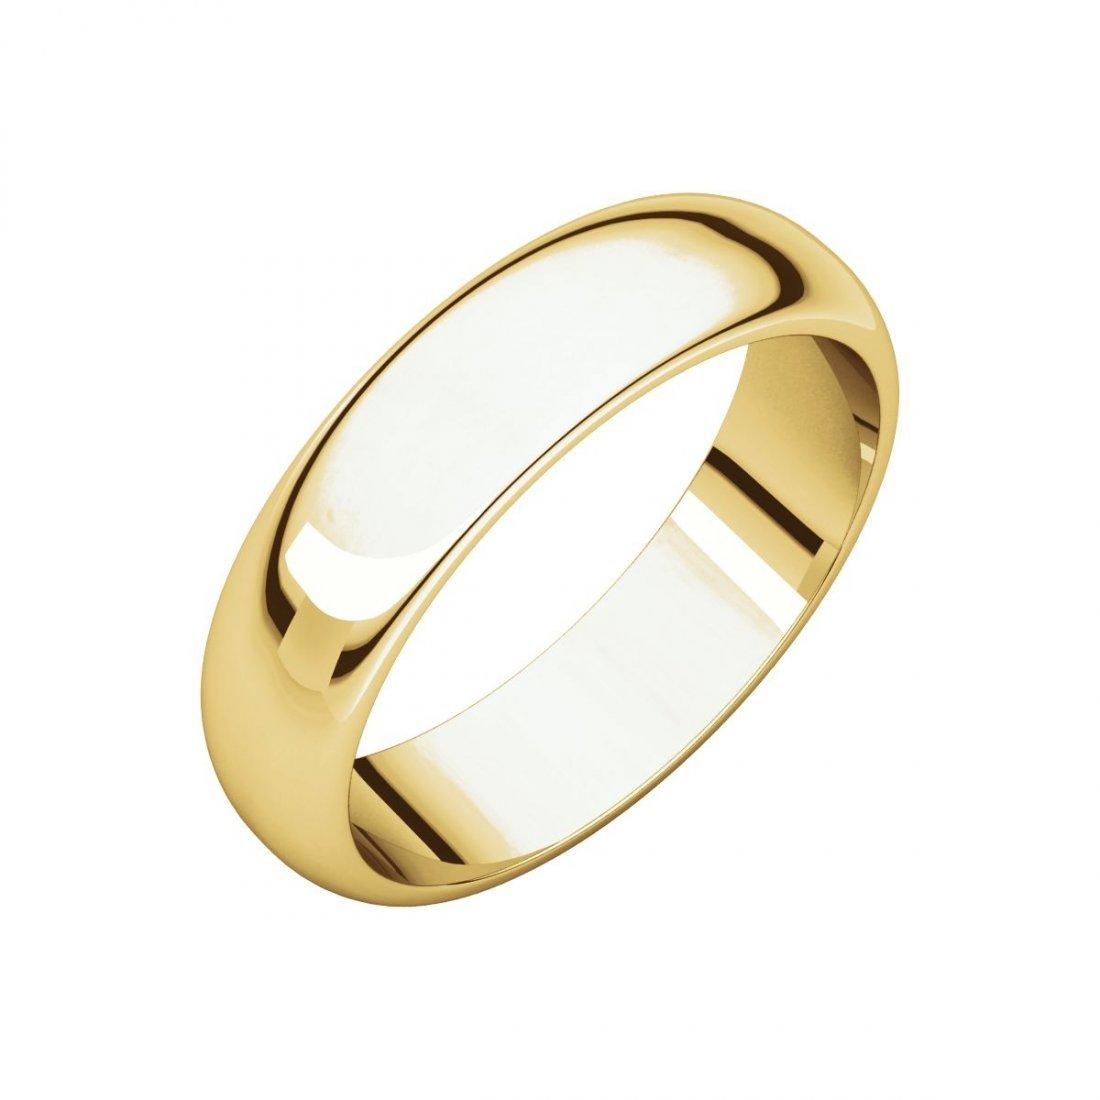 Ring - 10k Yellow Gold 5mm Half Round Band